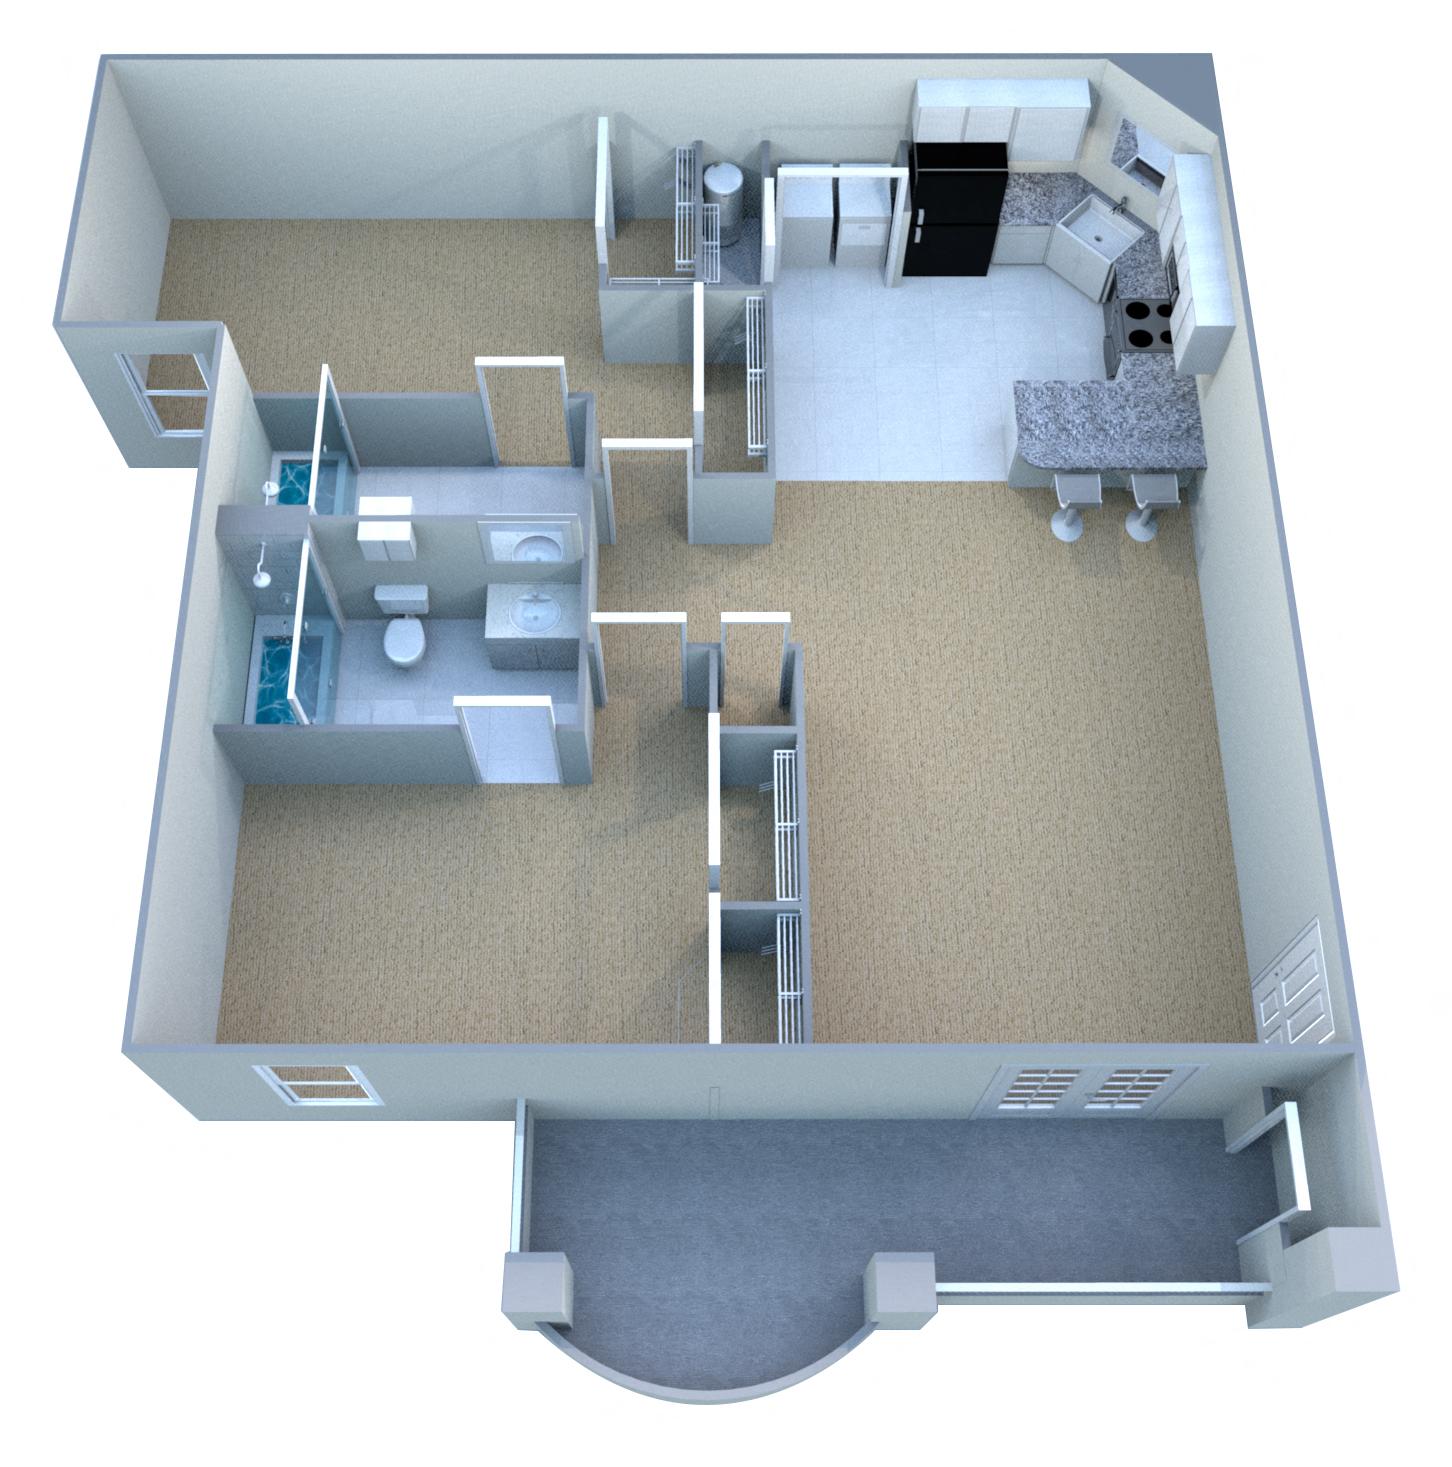 Owasso Apartments: Floor Plans Of The Greens At Owasso I/II In Owasso, OK